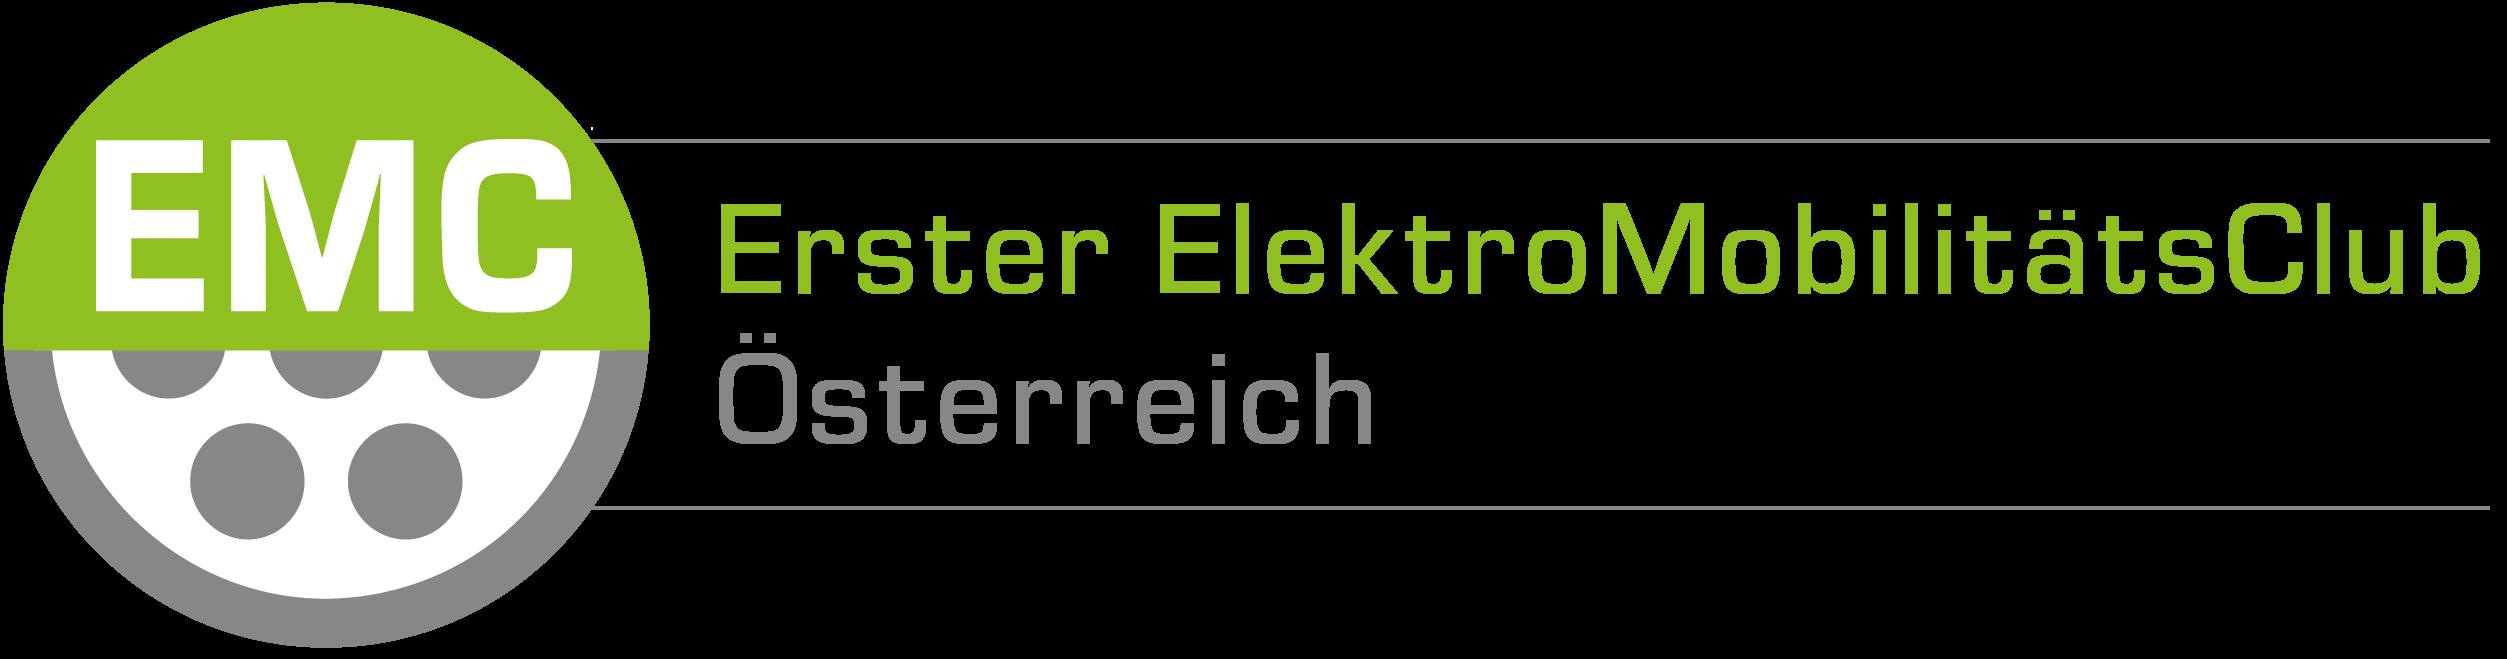 EMC-Logo-2-zeilig-4C